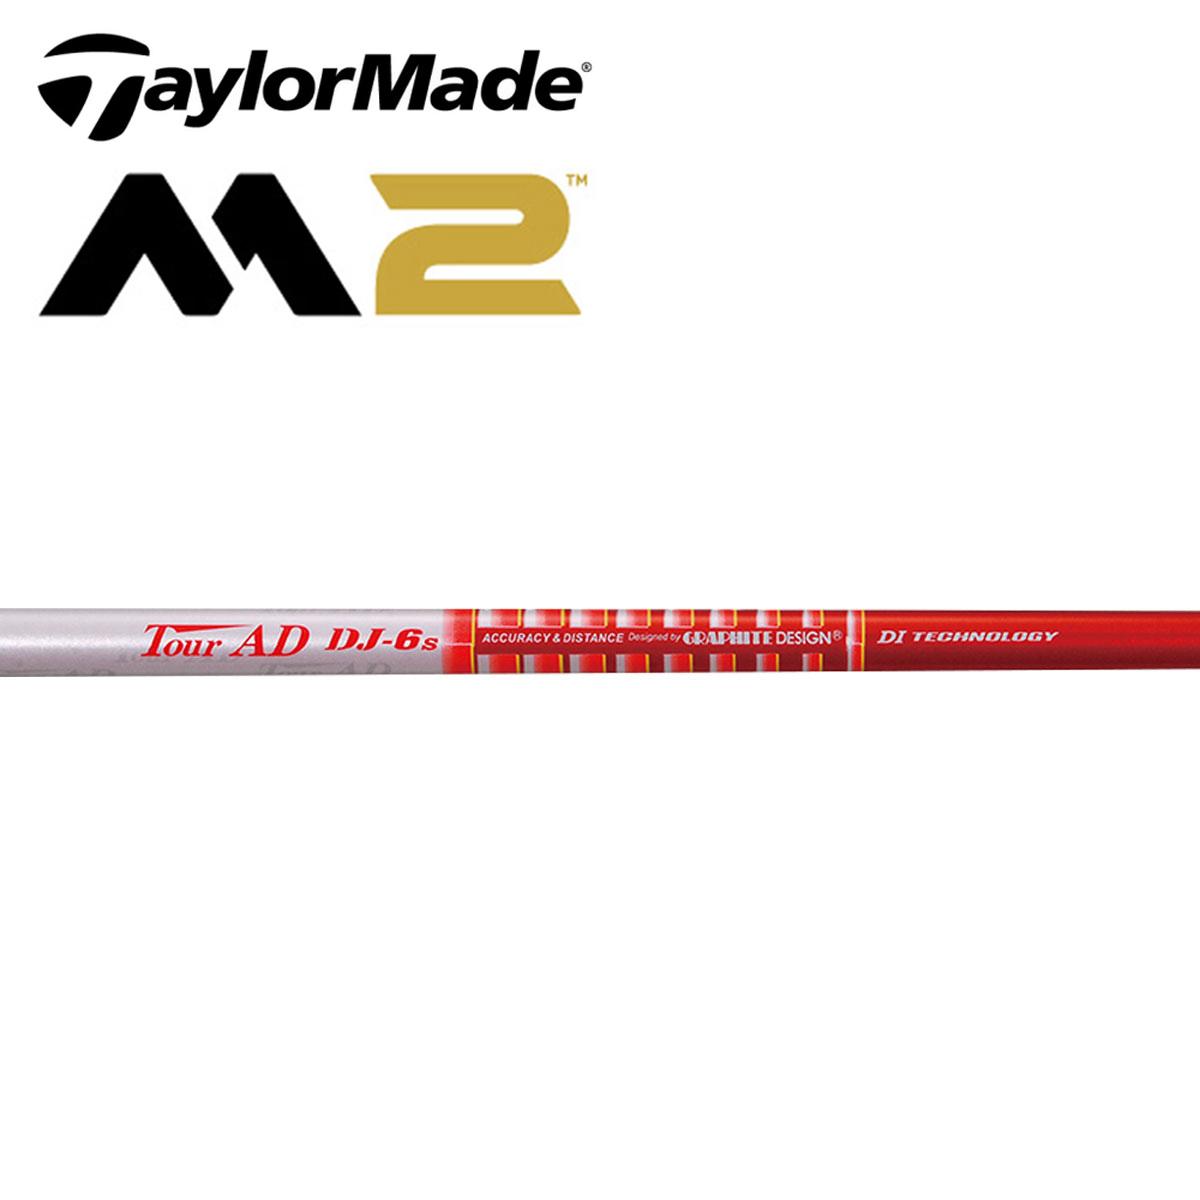 Tour AD DJシリーズ M2 ドライバーロフト12度用スリーブ付きシャフト 2016年モデル【テーラーメイド専用】